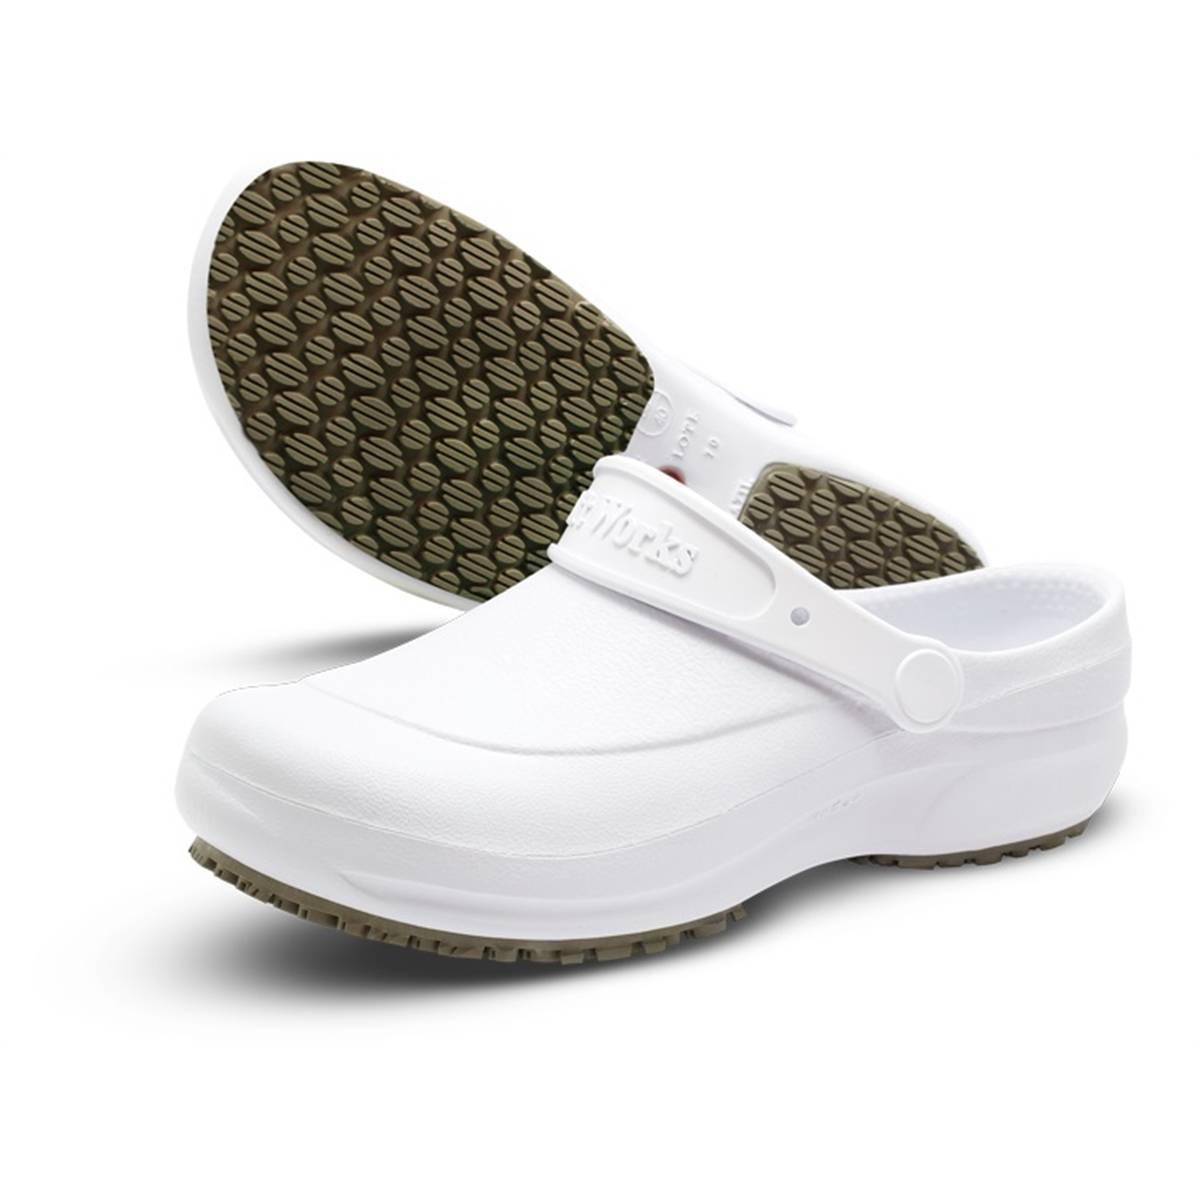 Sapato Profissional Soft Works Branco - Orto Curitiba